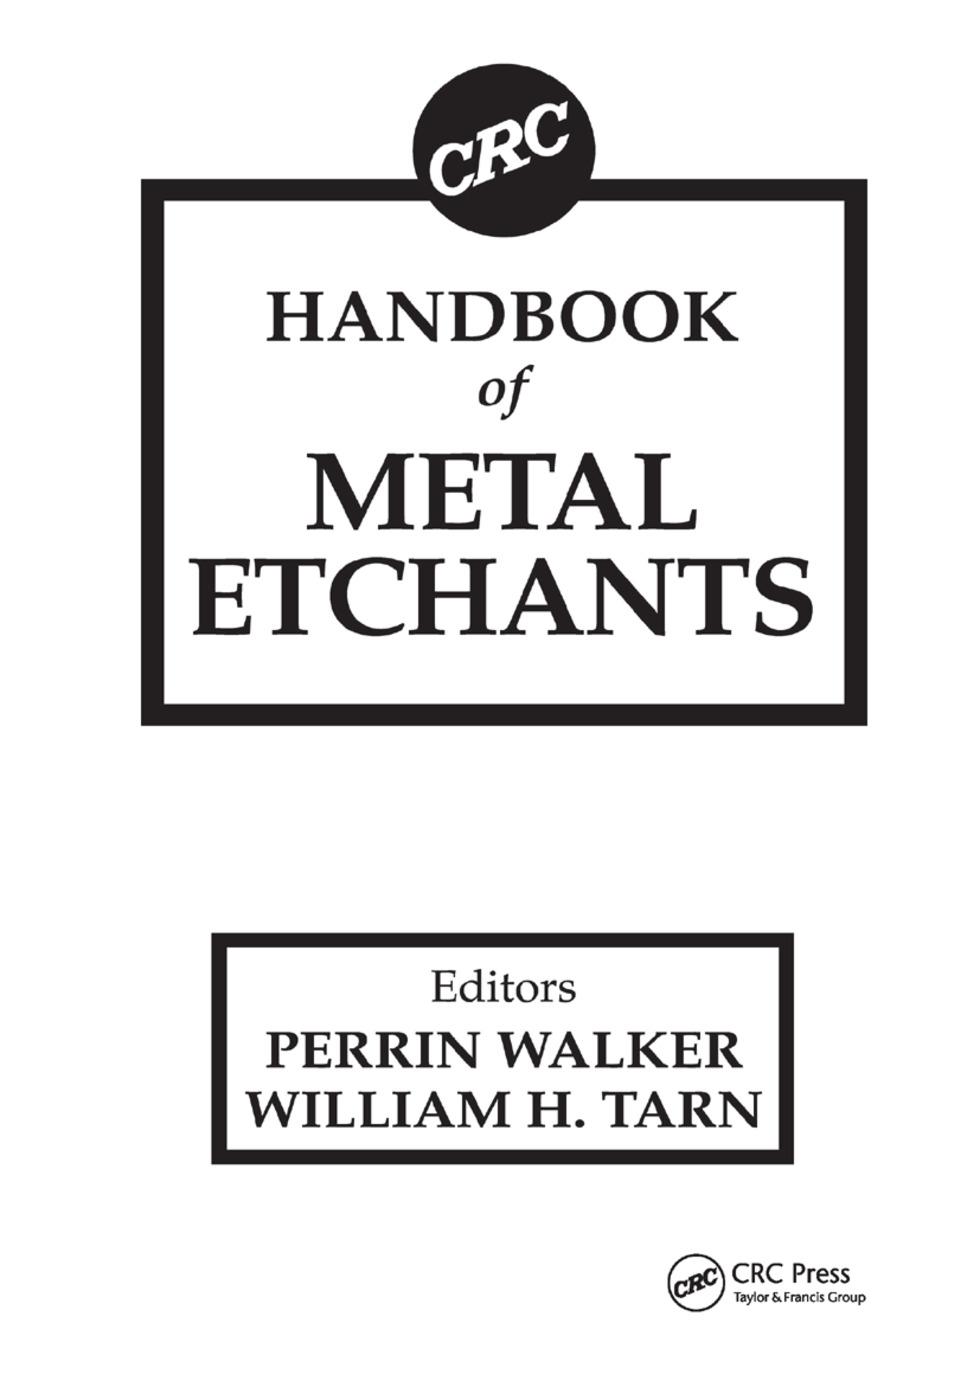 CRC Handbook of Metal Etchants book cover